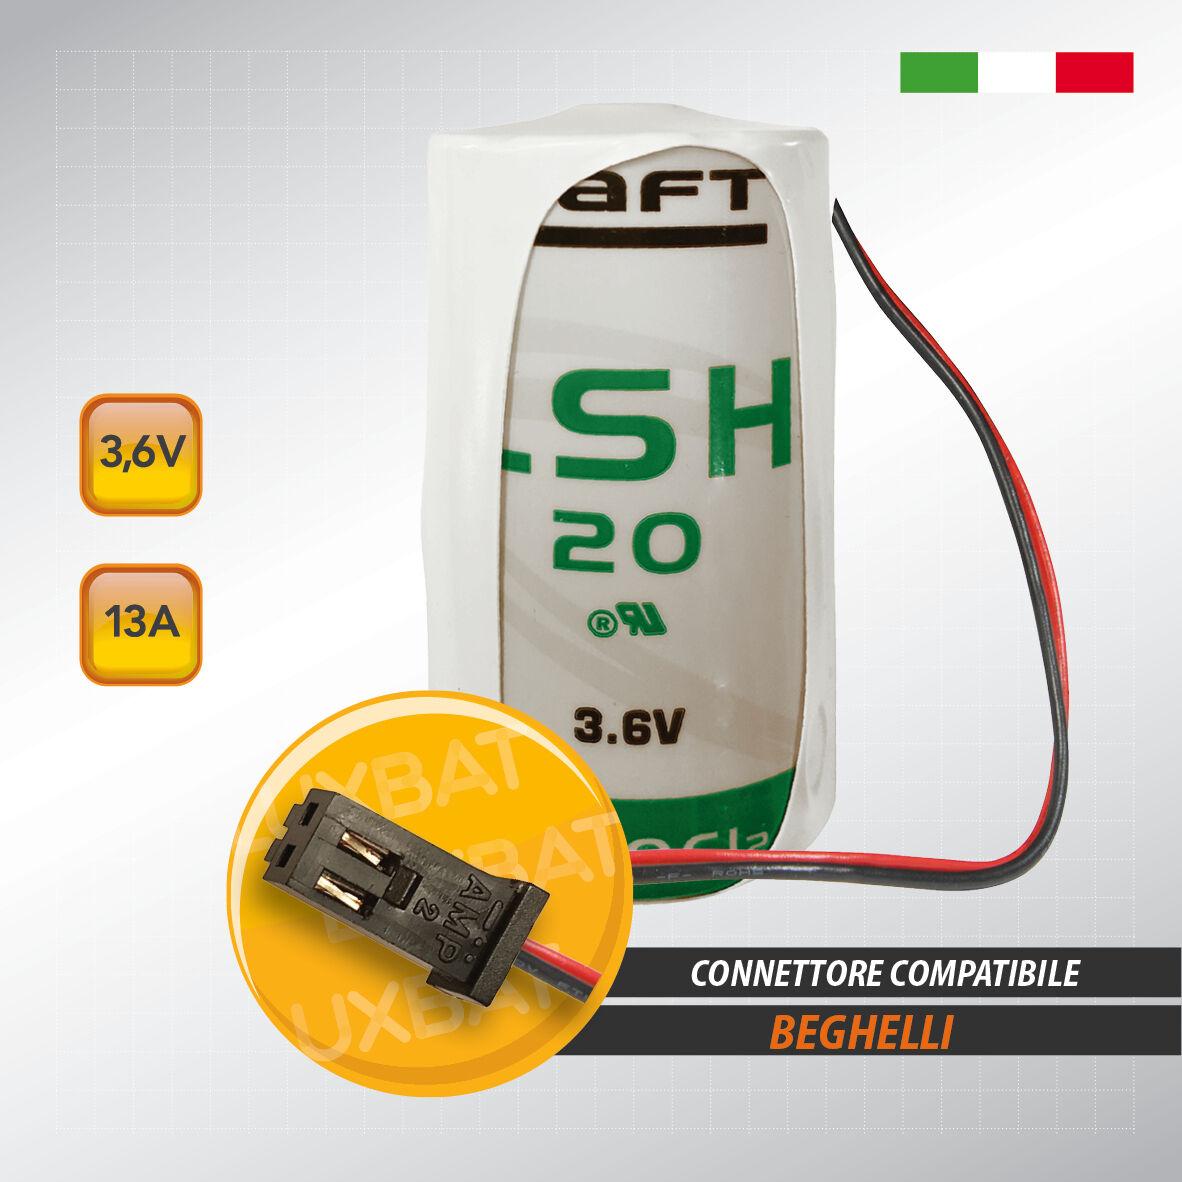 Trio lsh20 3,6v 13ah Lithium Battery Saft Size D er34615m